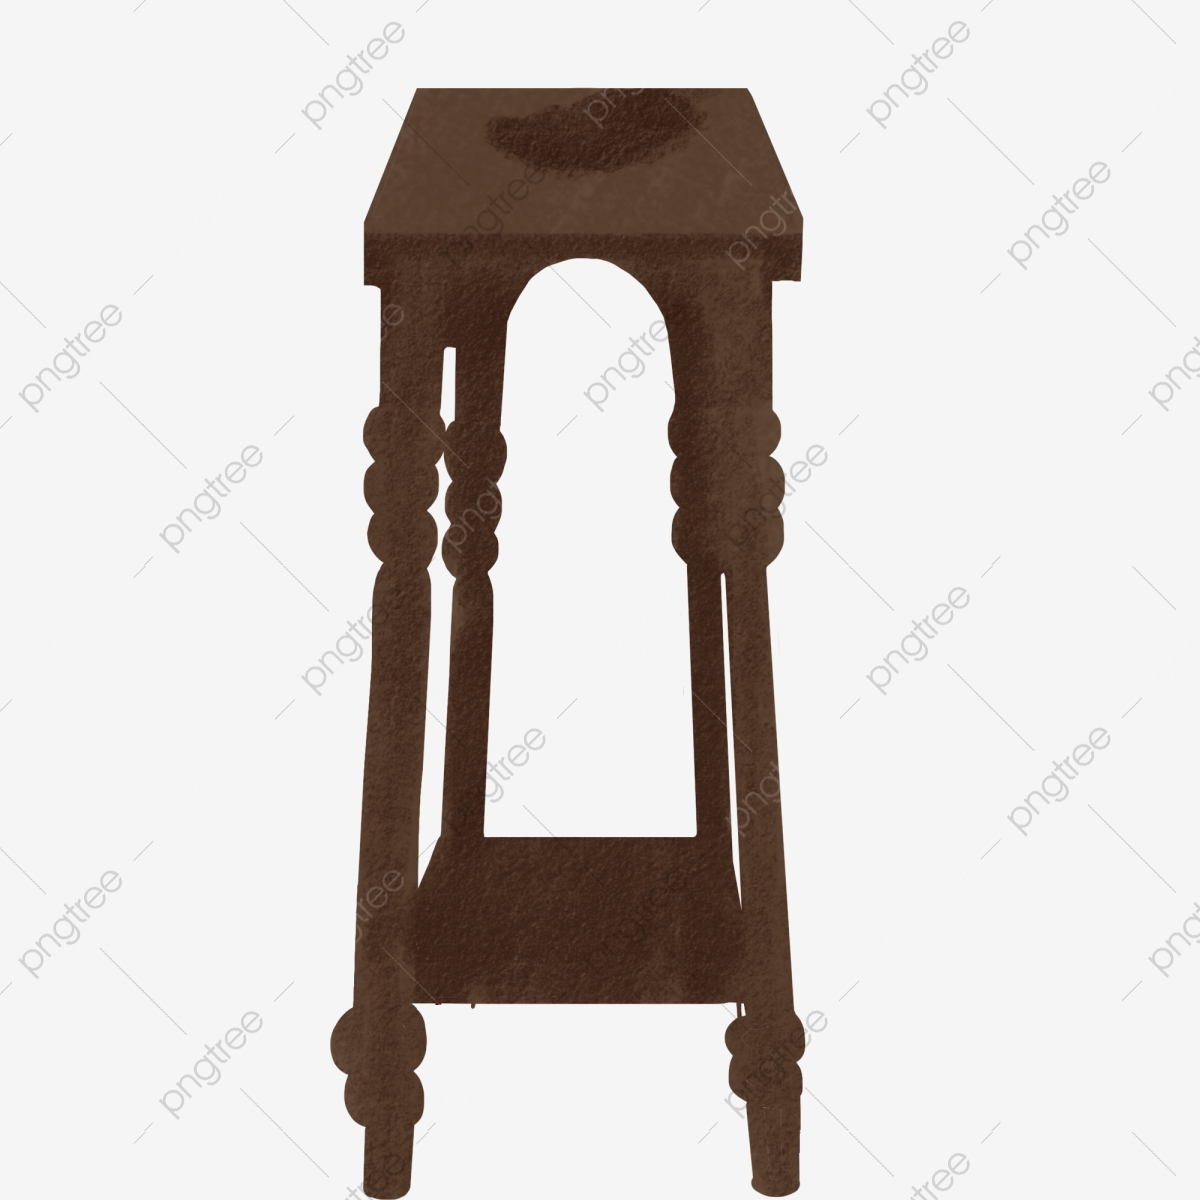 Excellent A Wooden Cartoon Stool Stools Wooden Goods Png Alphanode Cool Chair Designs And Ideas Alphanodeonline